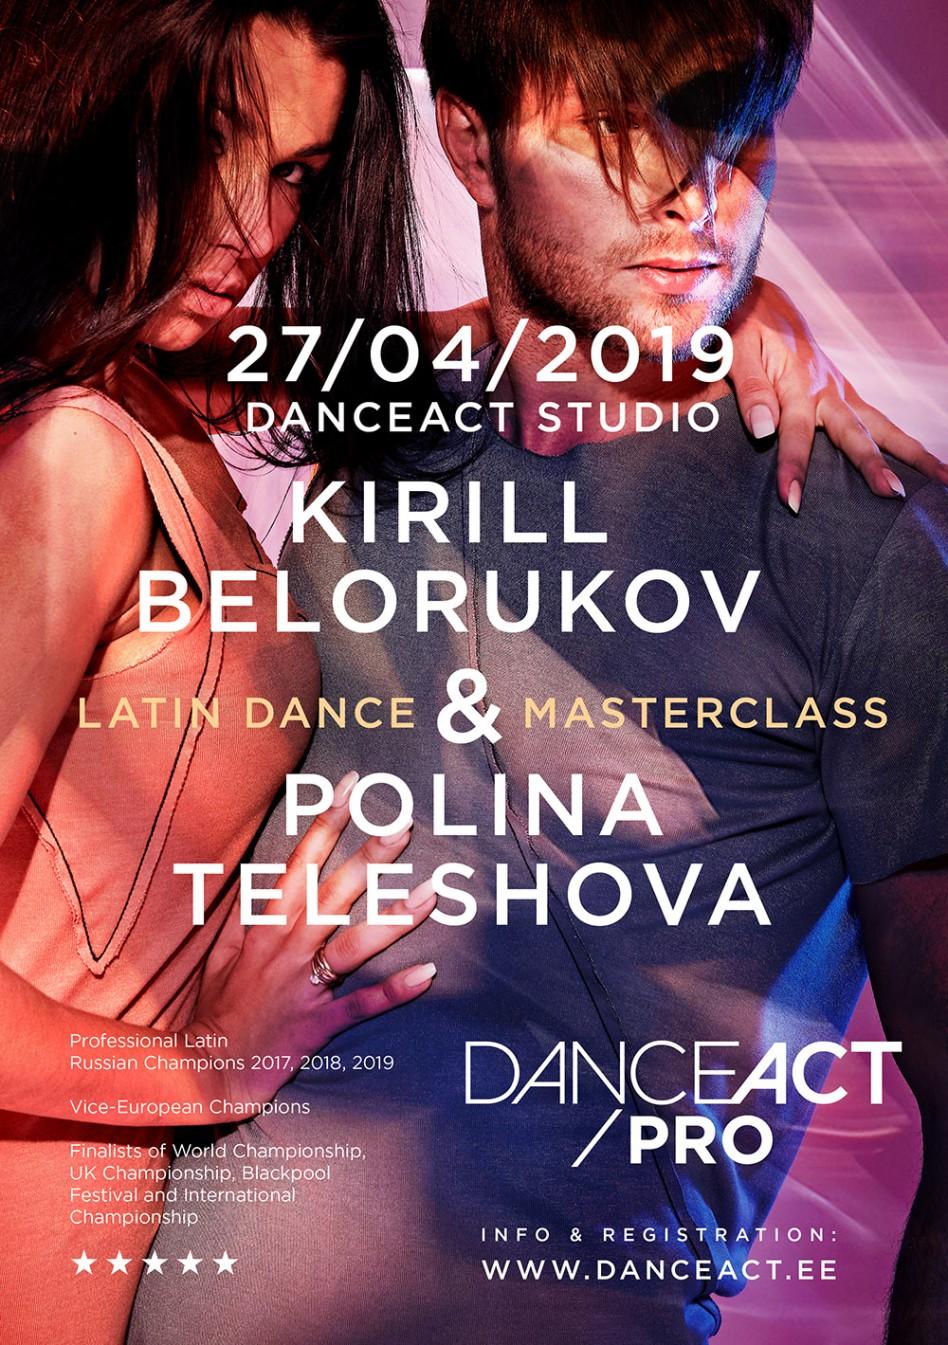 KIRILL BELORUKOV & POLINA TELESHOVA latin american dance sport lecture and classes | April 27h @ DanceAct